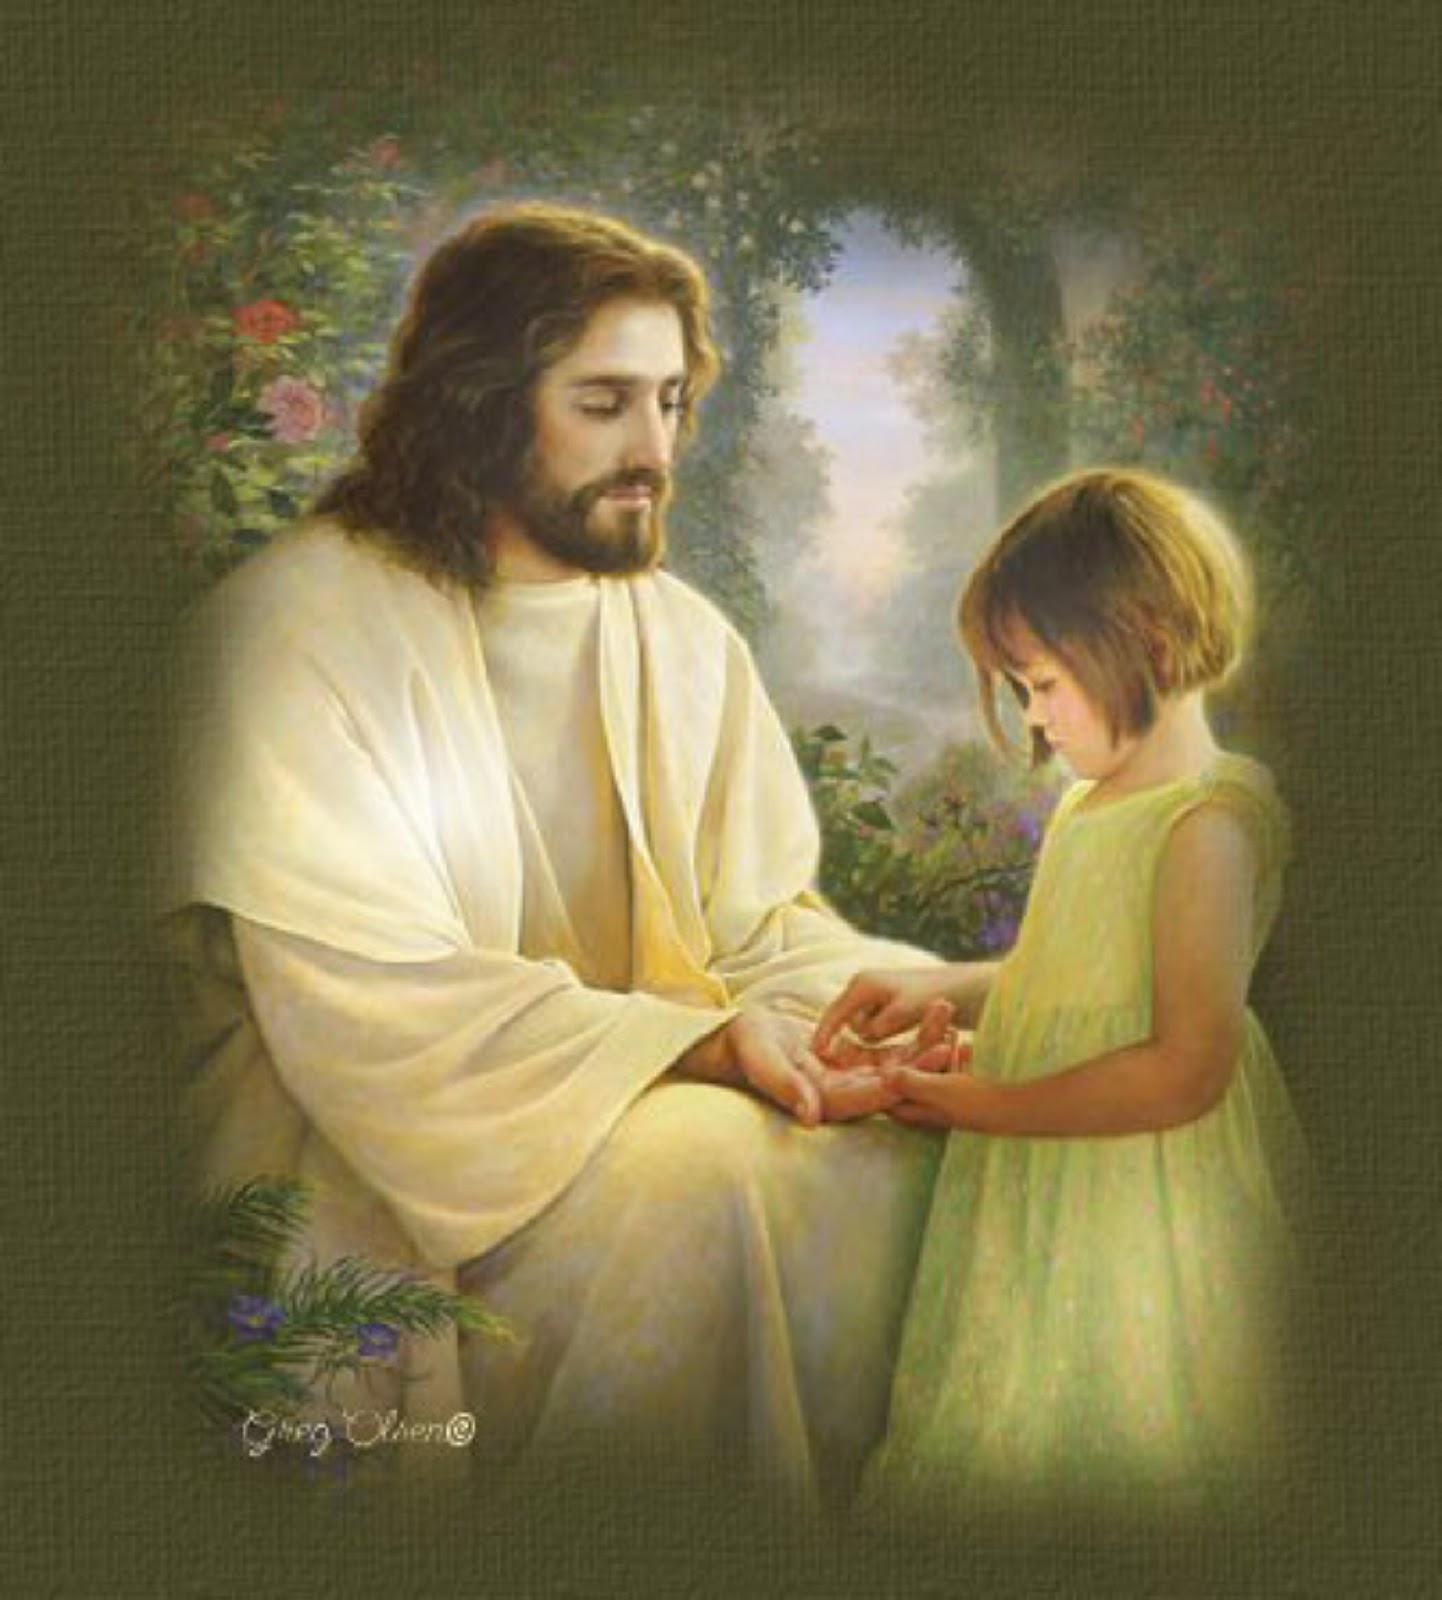 Jesus christ pictures picture pool - Wallpaper de jesus ...